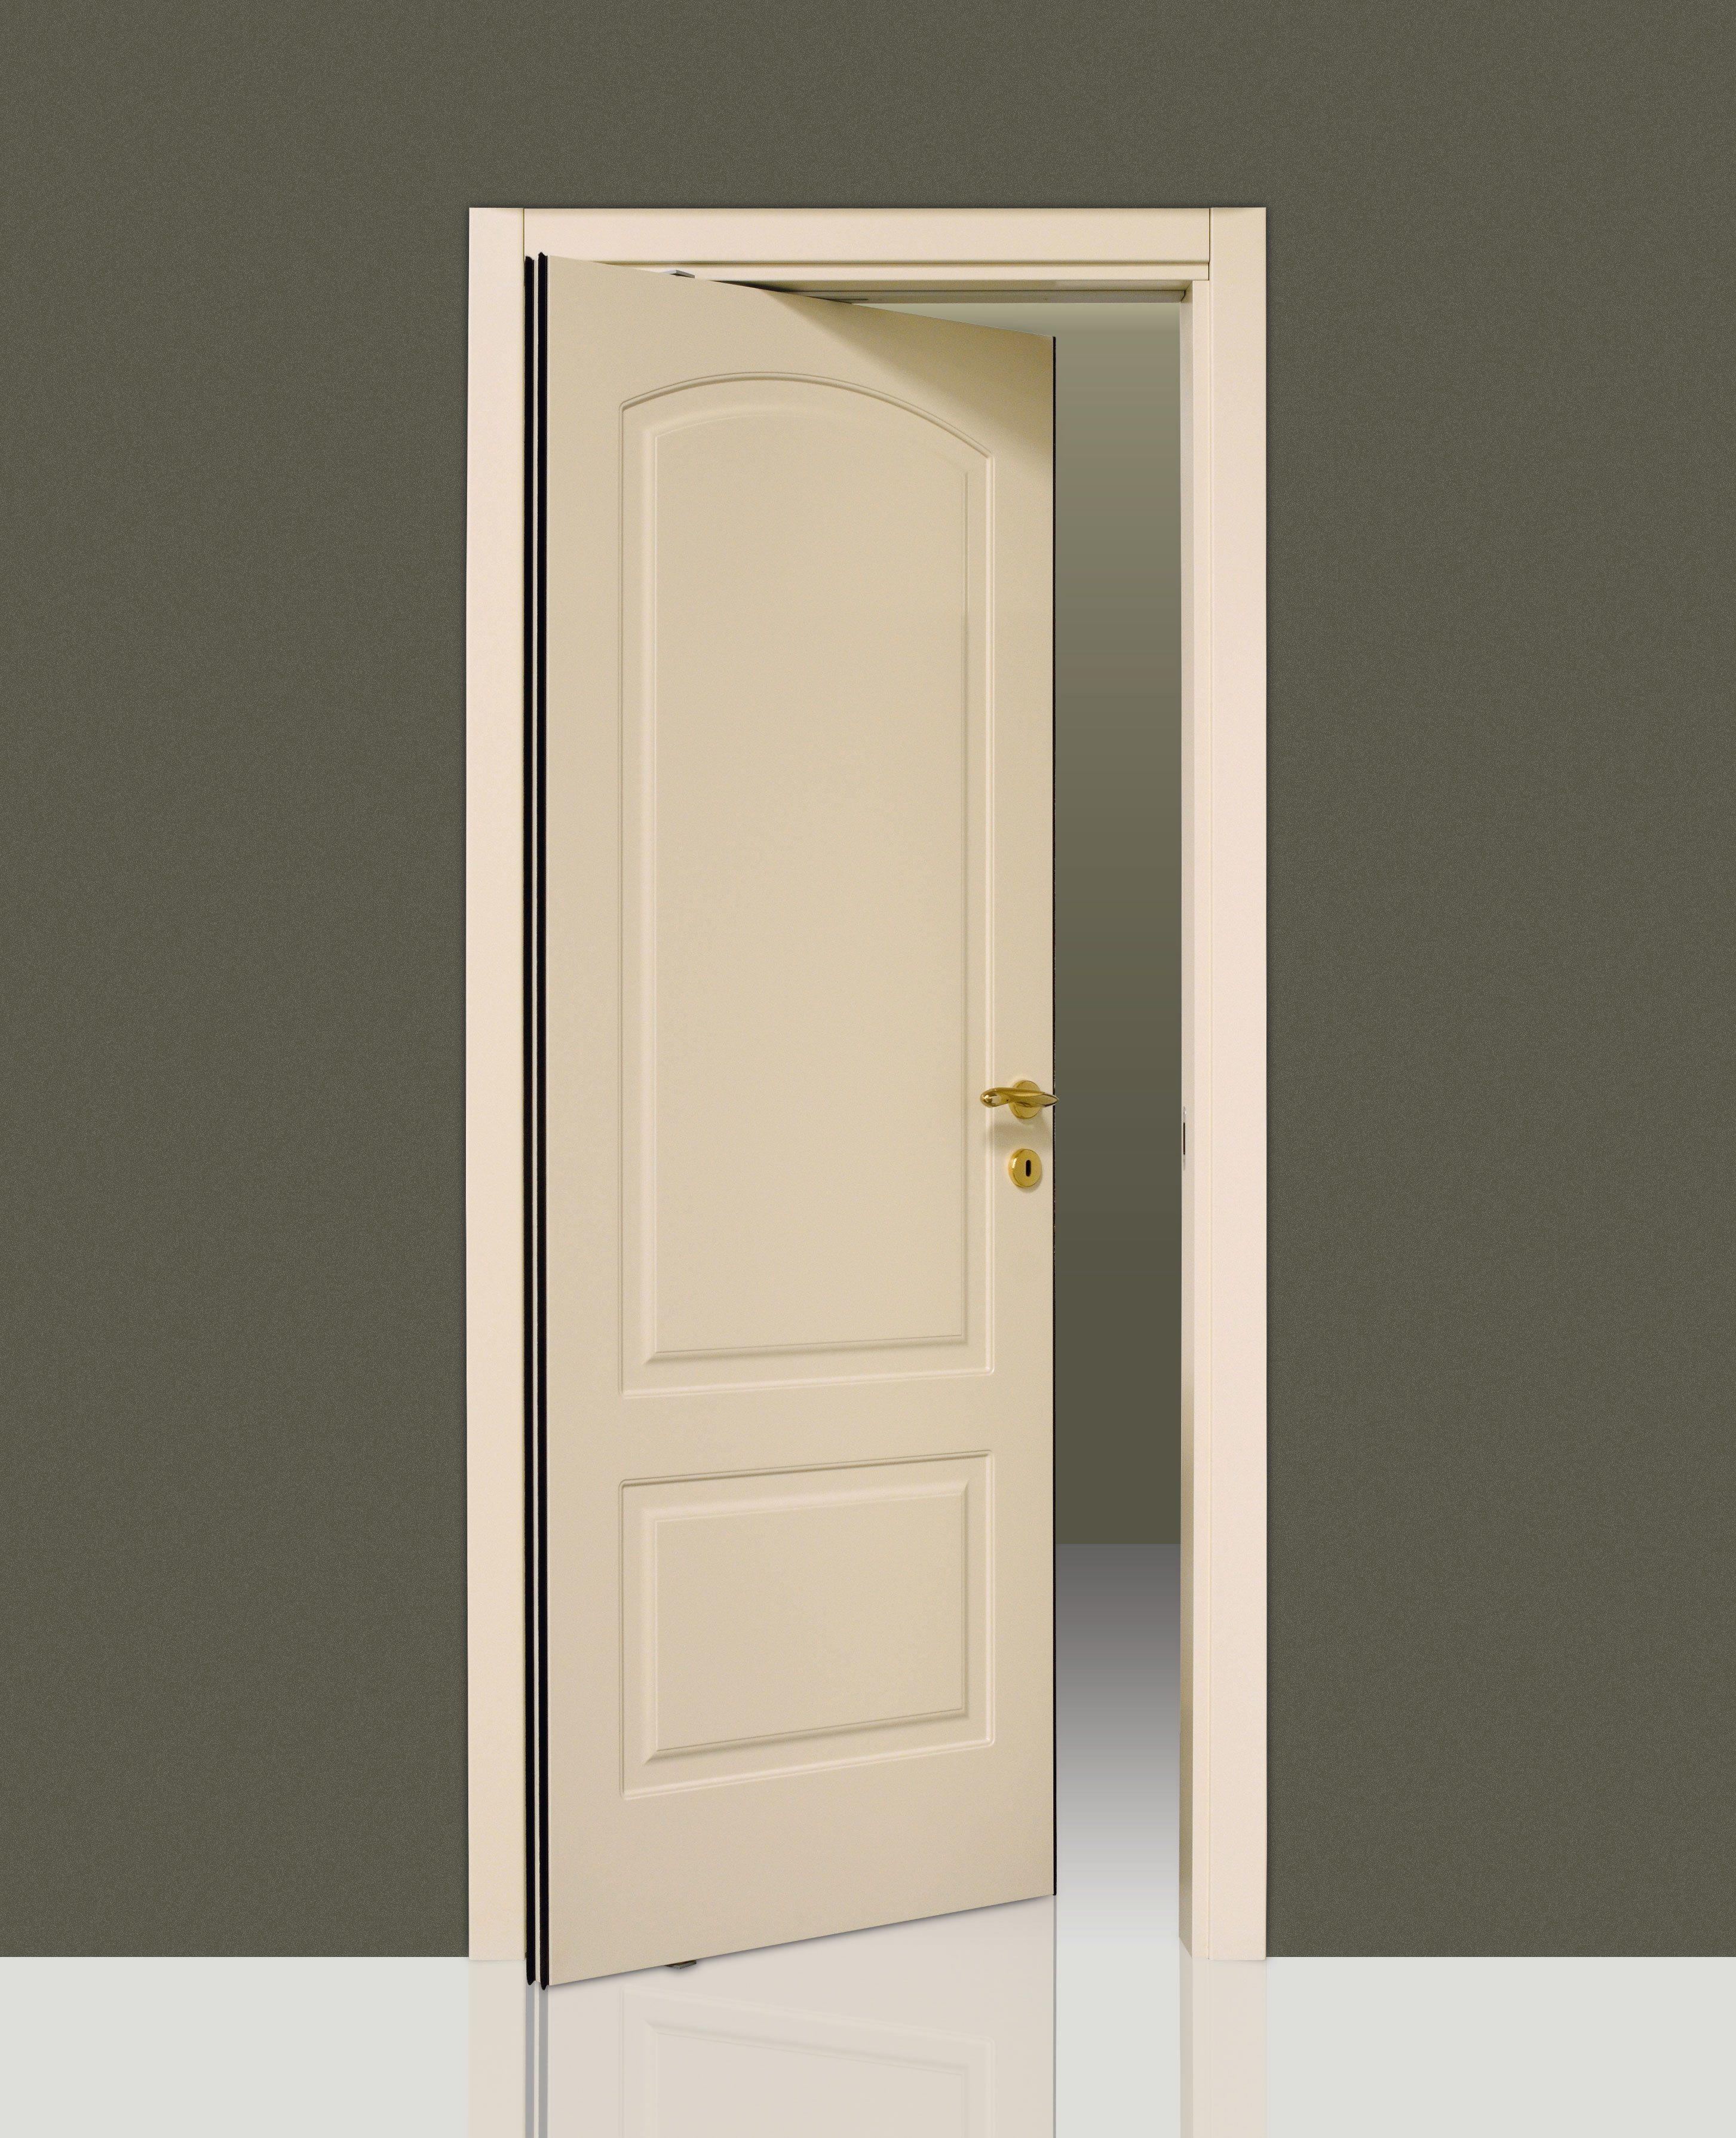 Porte laccate pantografate Aaron - Civico14 - Porte interne e ...